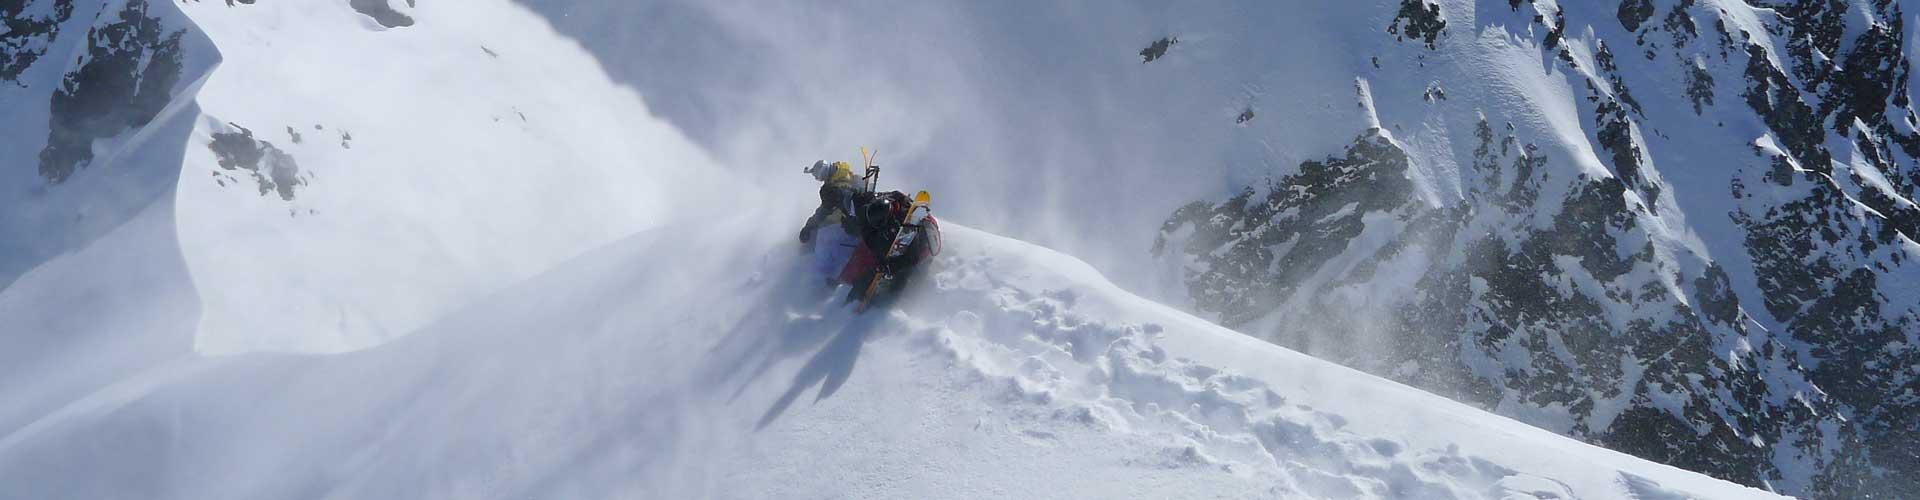 3 Days Andes Heli Ski Package – 8 People